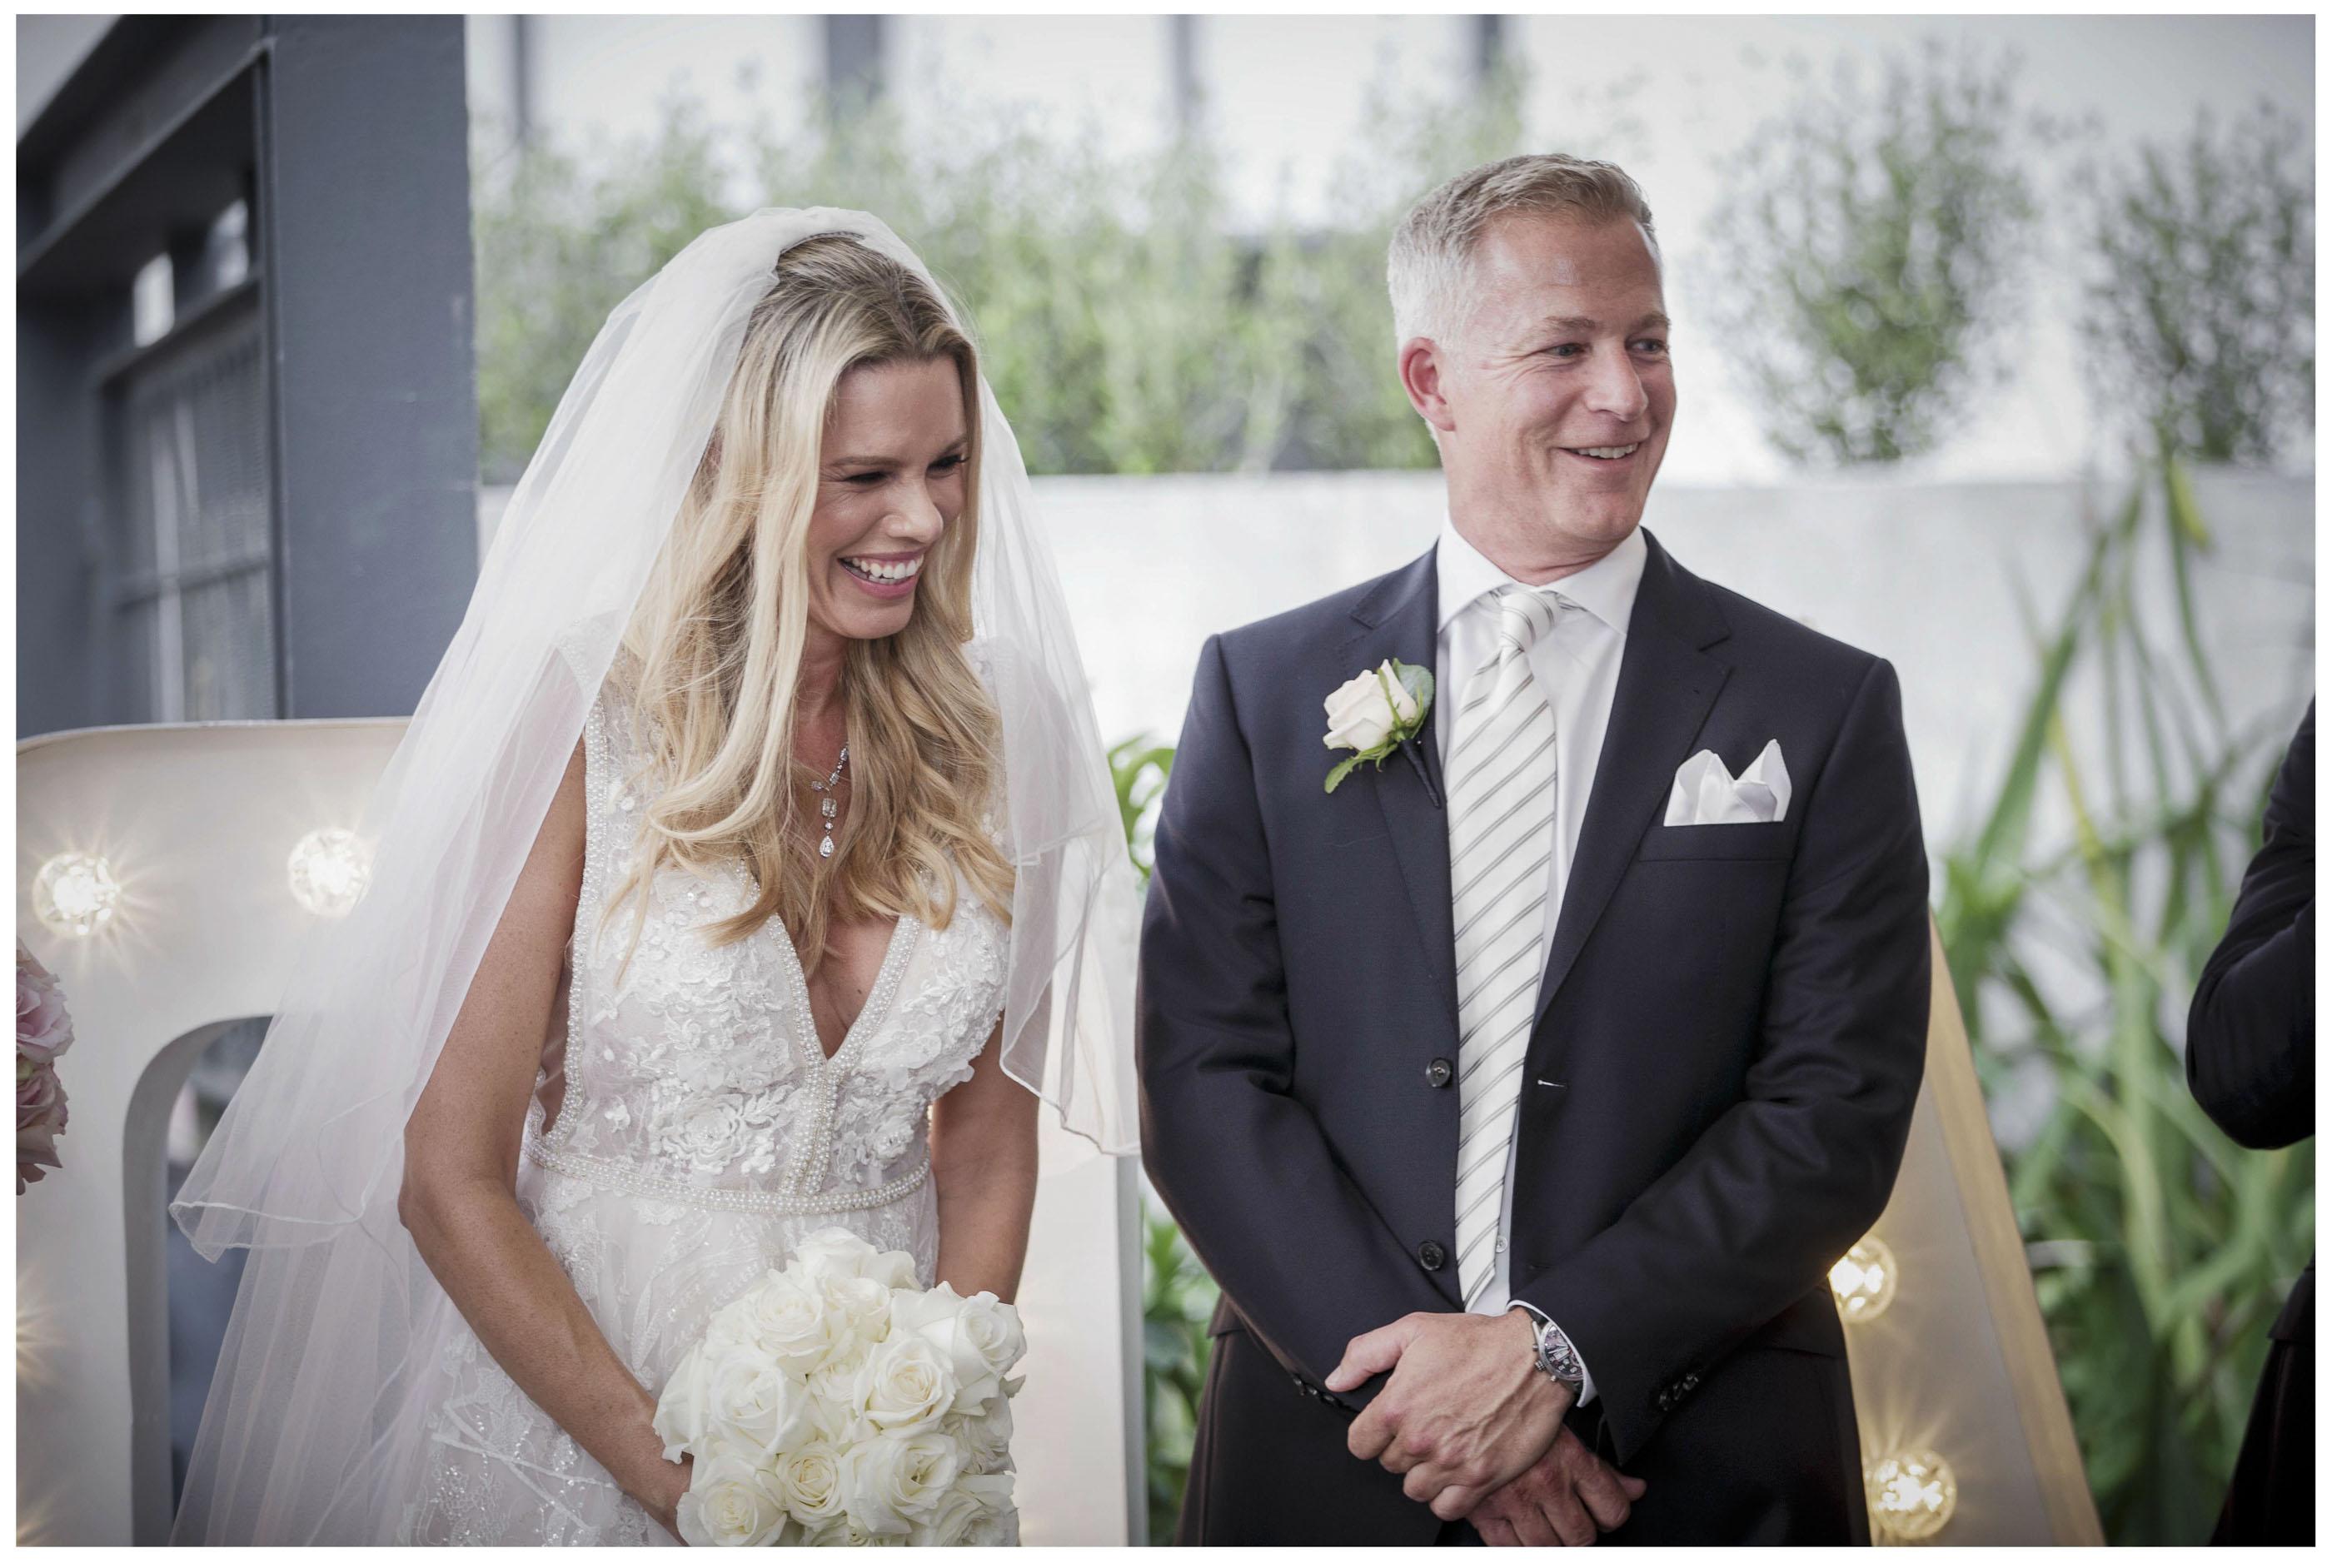 Wedding photo at Cibo Parnell by Chris Loufte www.theweddingphotographer.co.nz